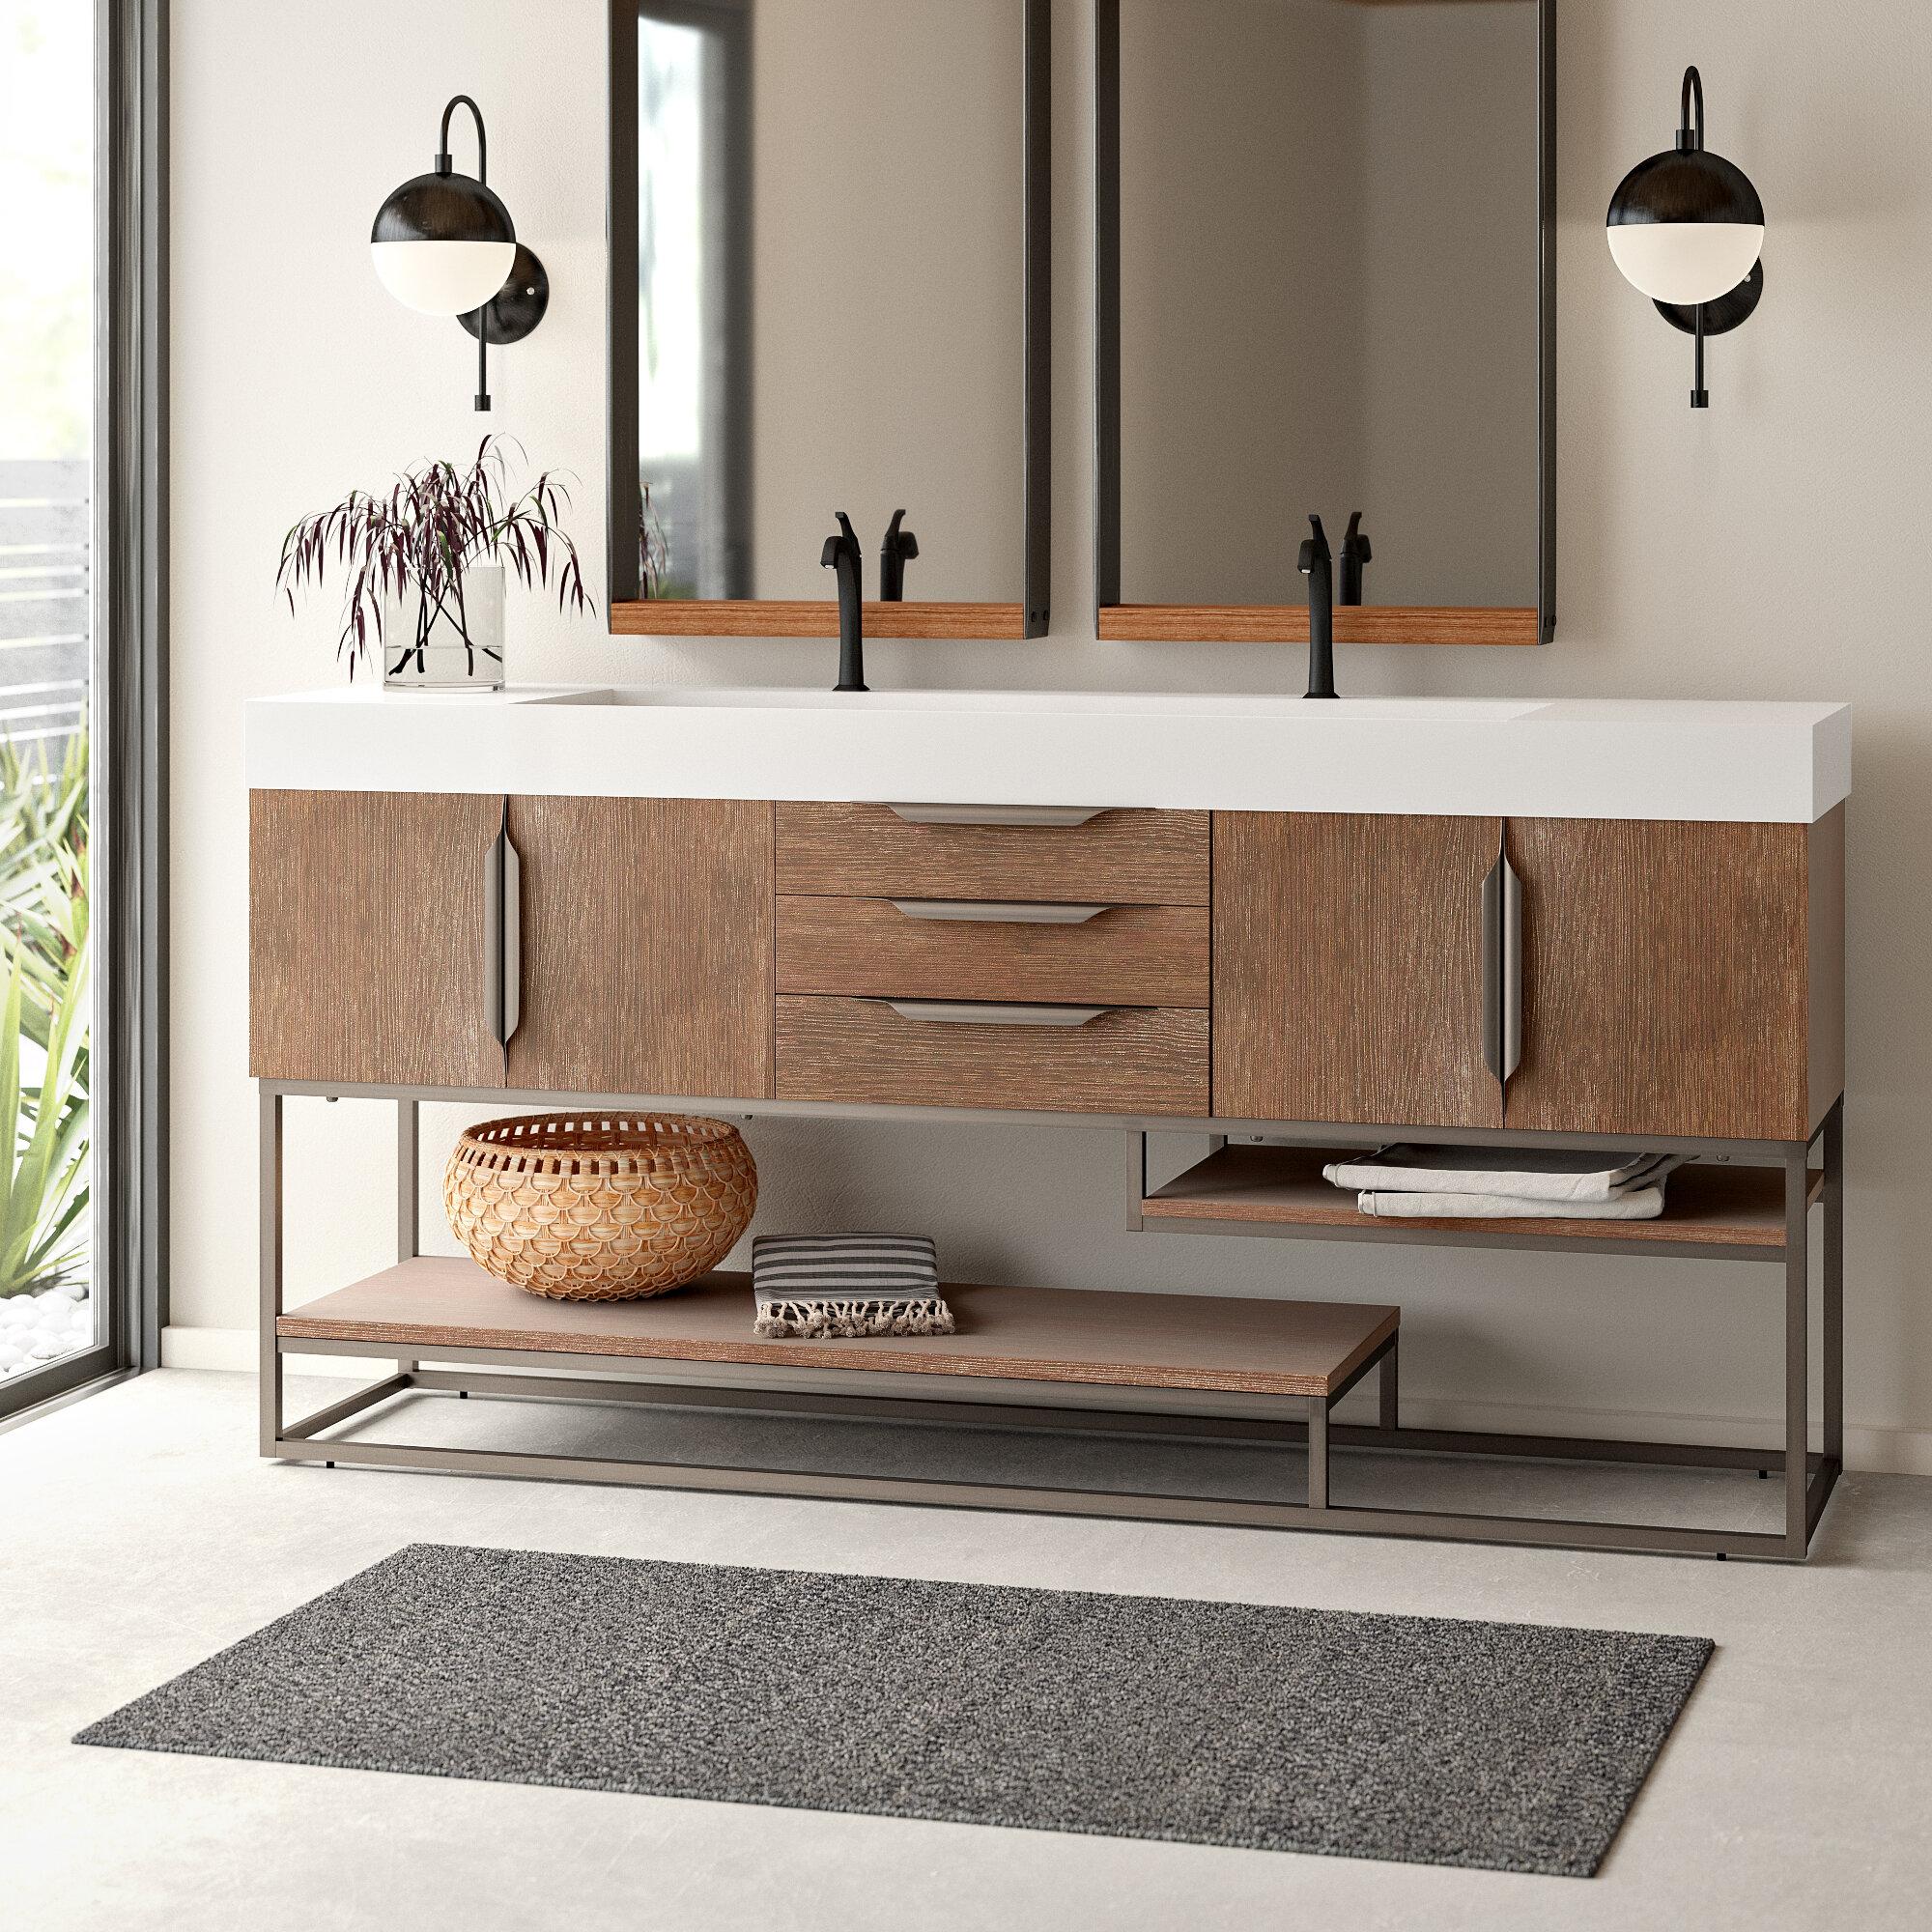 72 Inch Modern Contemporary Bathroom Vanities You Ll Love In 2020 Wayfair